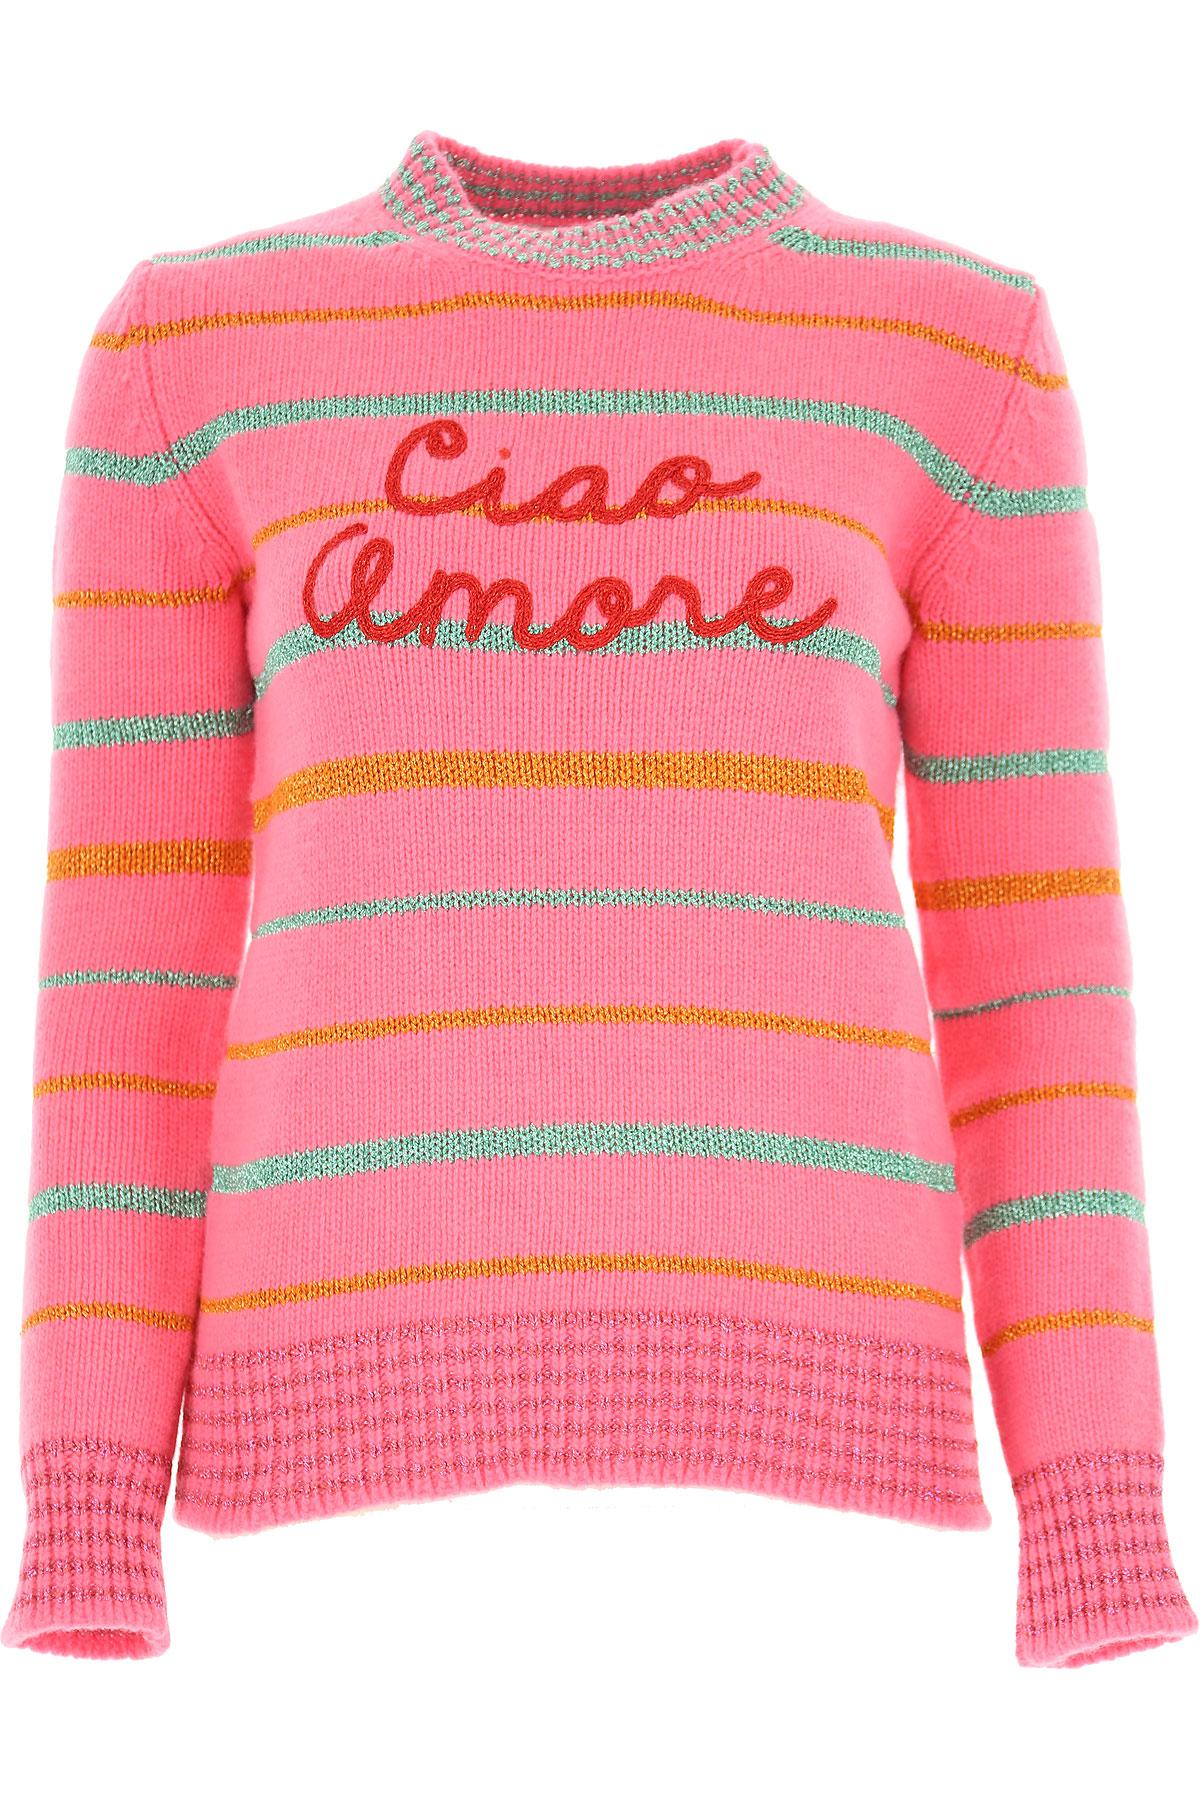 Image of Giada Benincasa Sweater for Women Jumper, Pink, Merinos Wool, 2017, 2 4